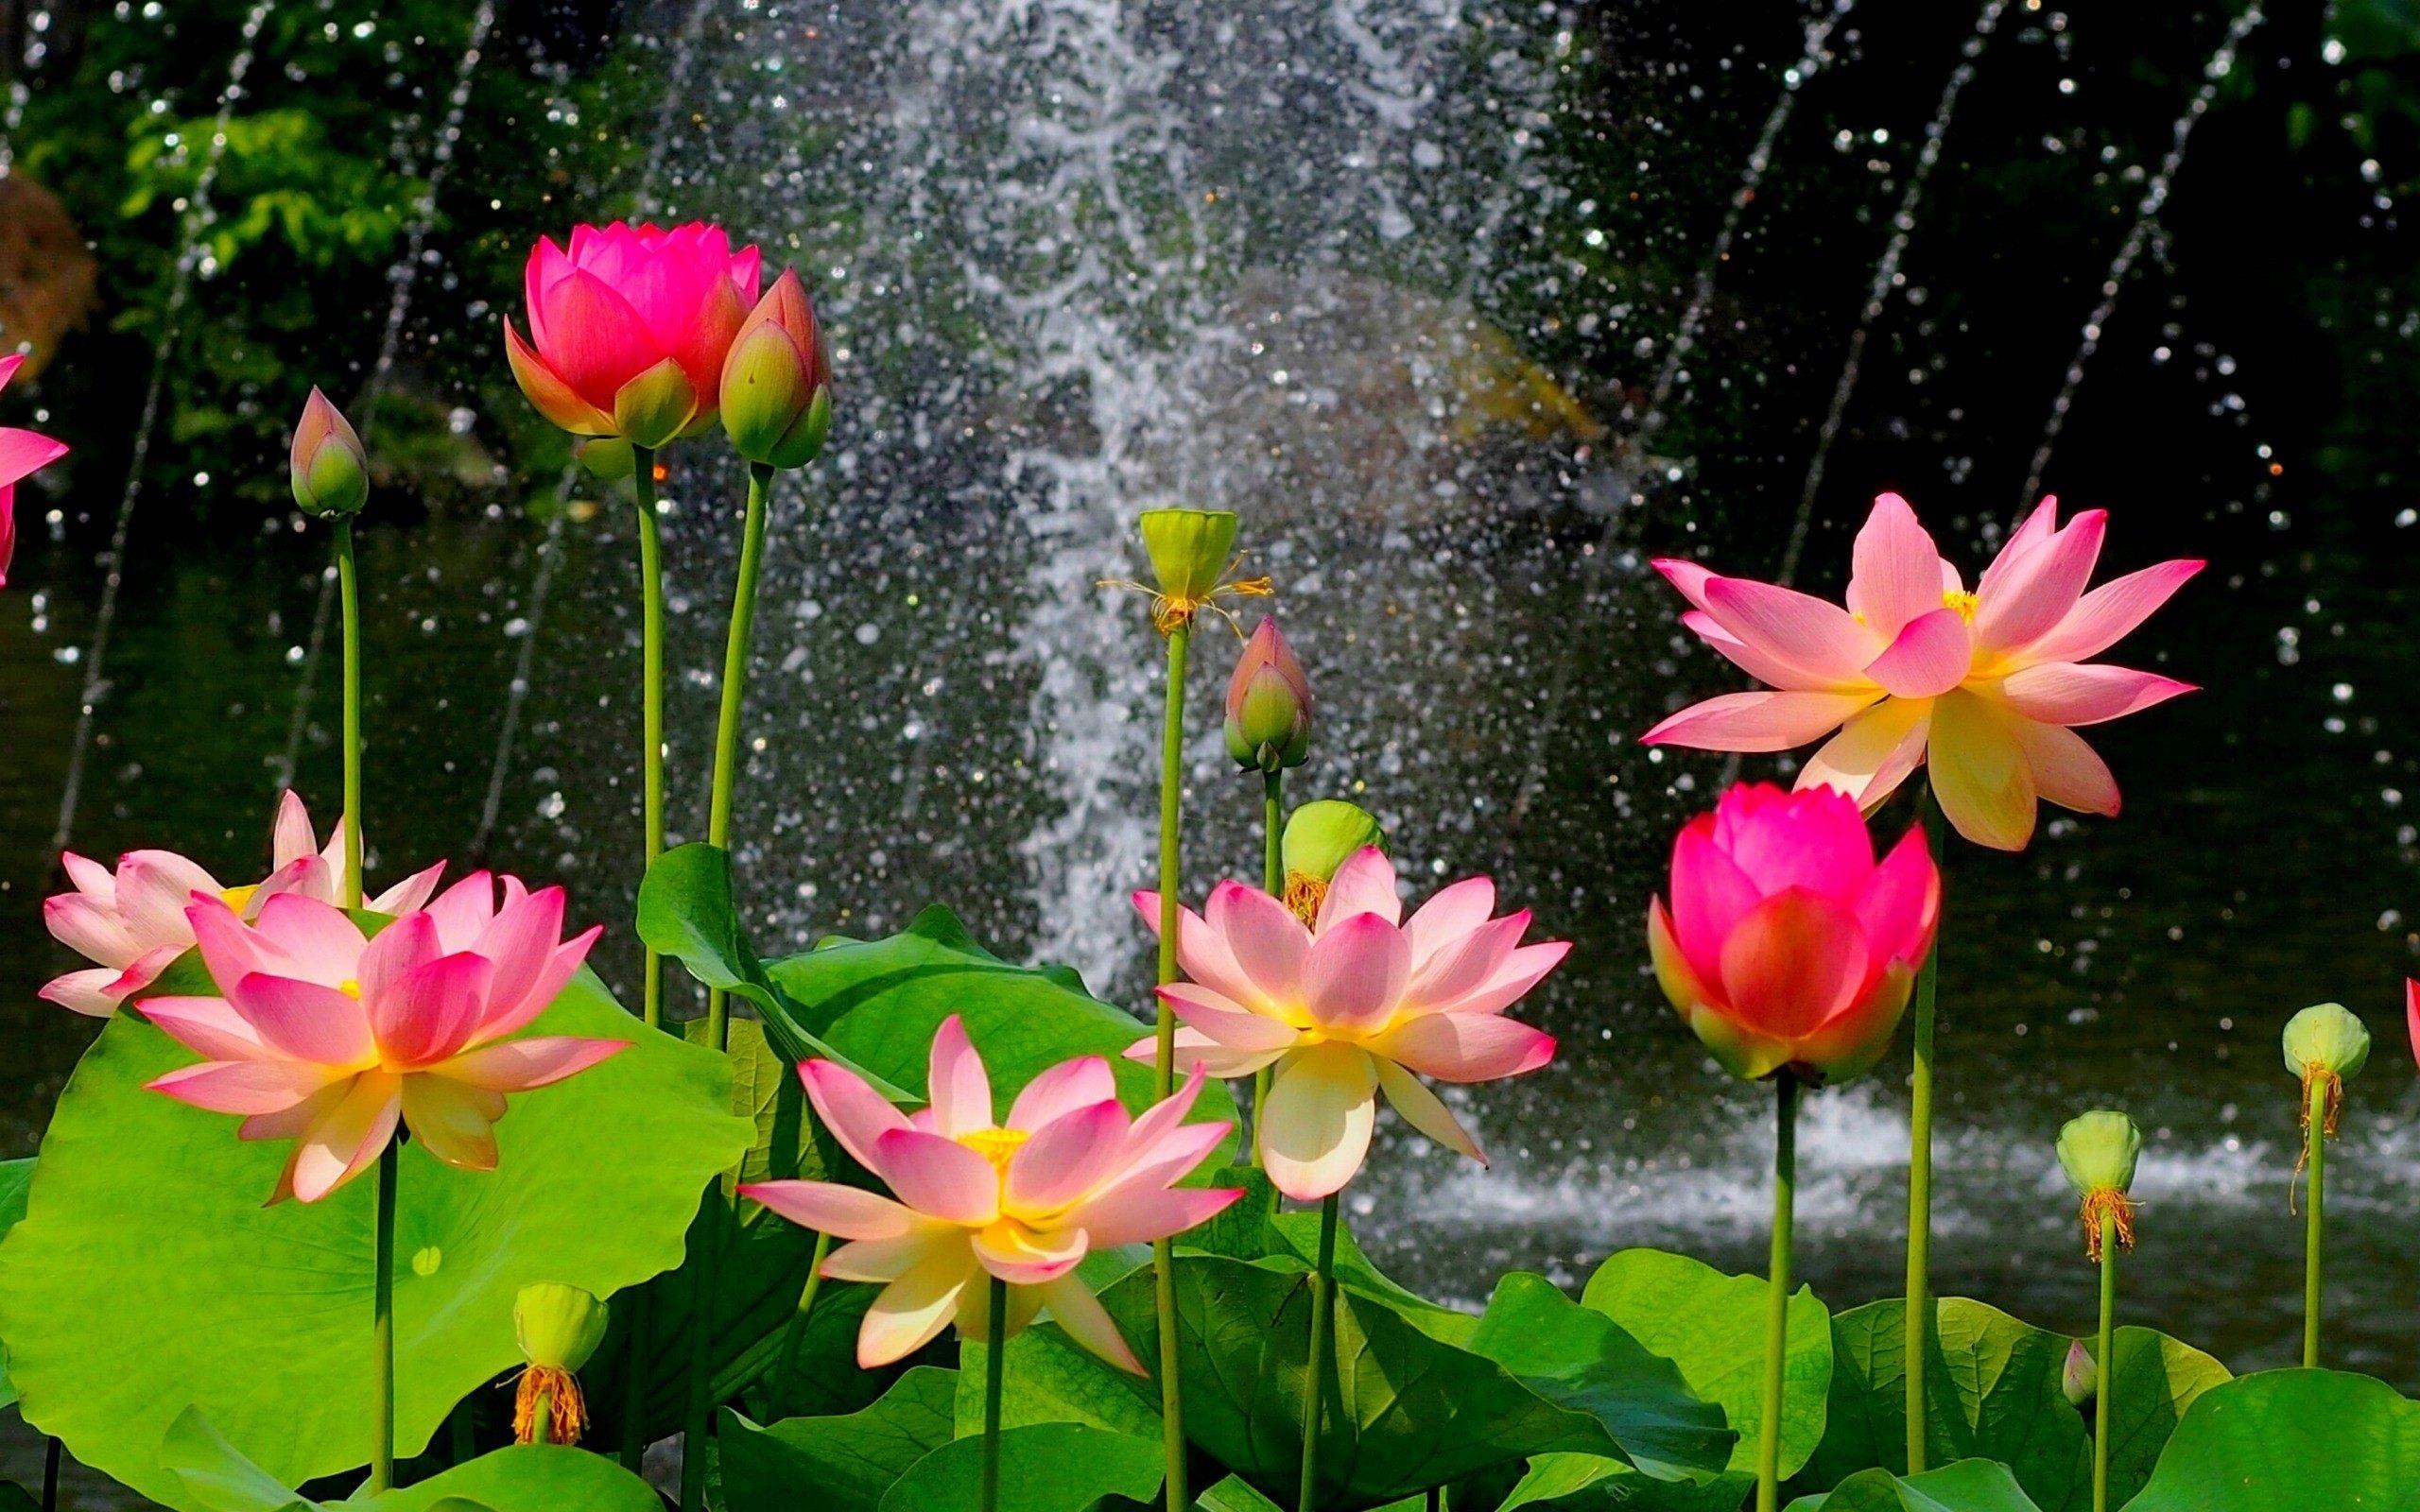 Most beautiful lotus flower wallpaper sharovarka pinterest most beautiful lotus flower wallpaper izmirmasajfo Images